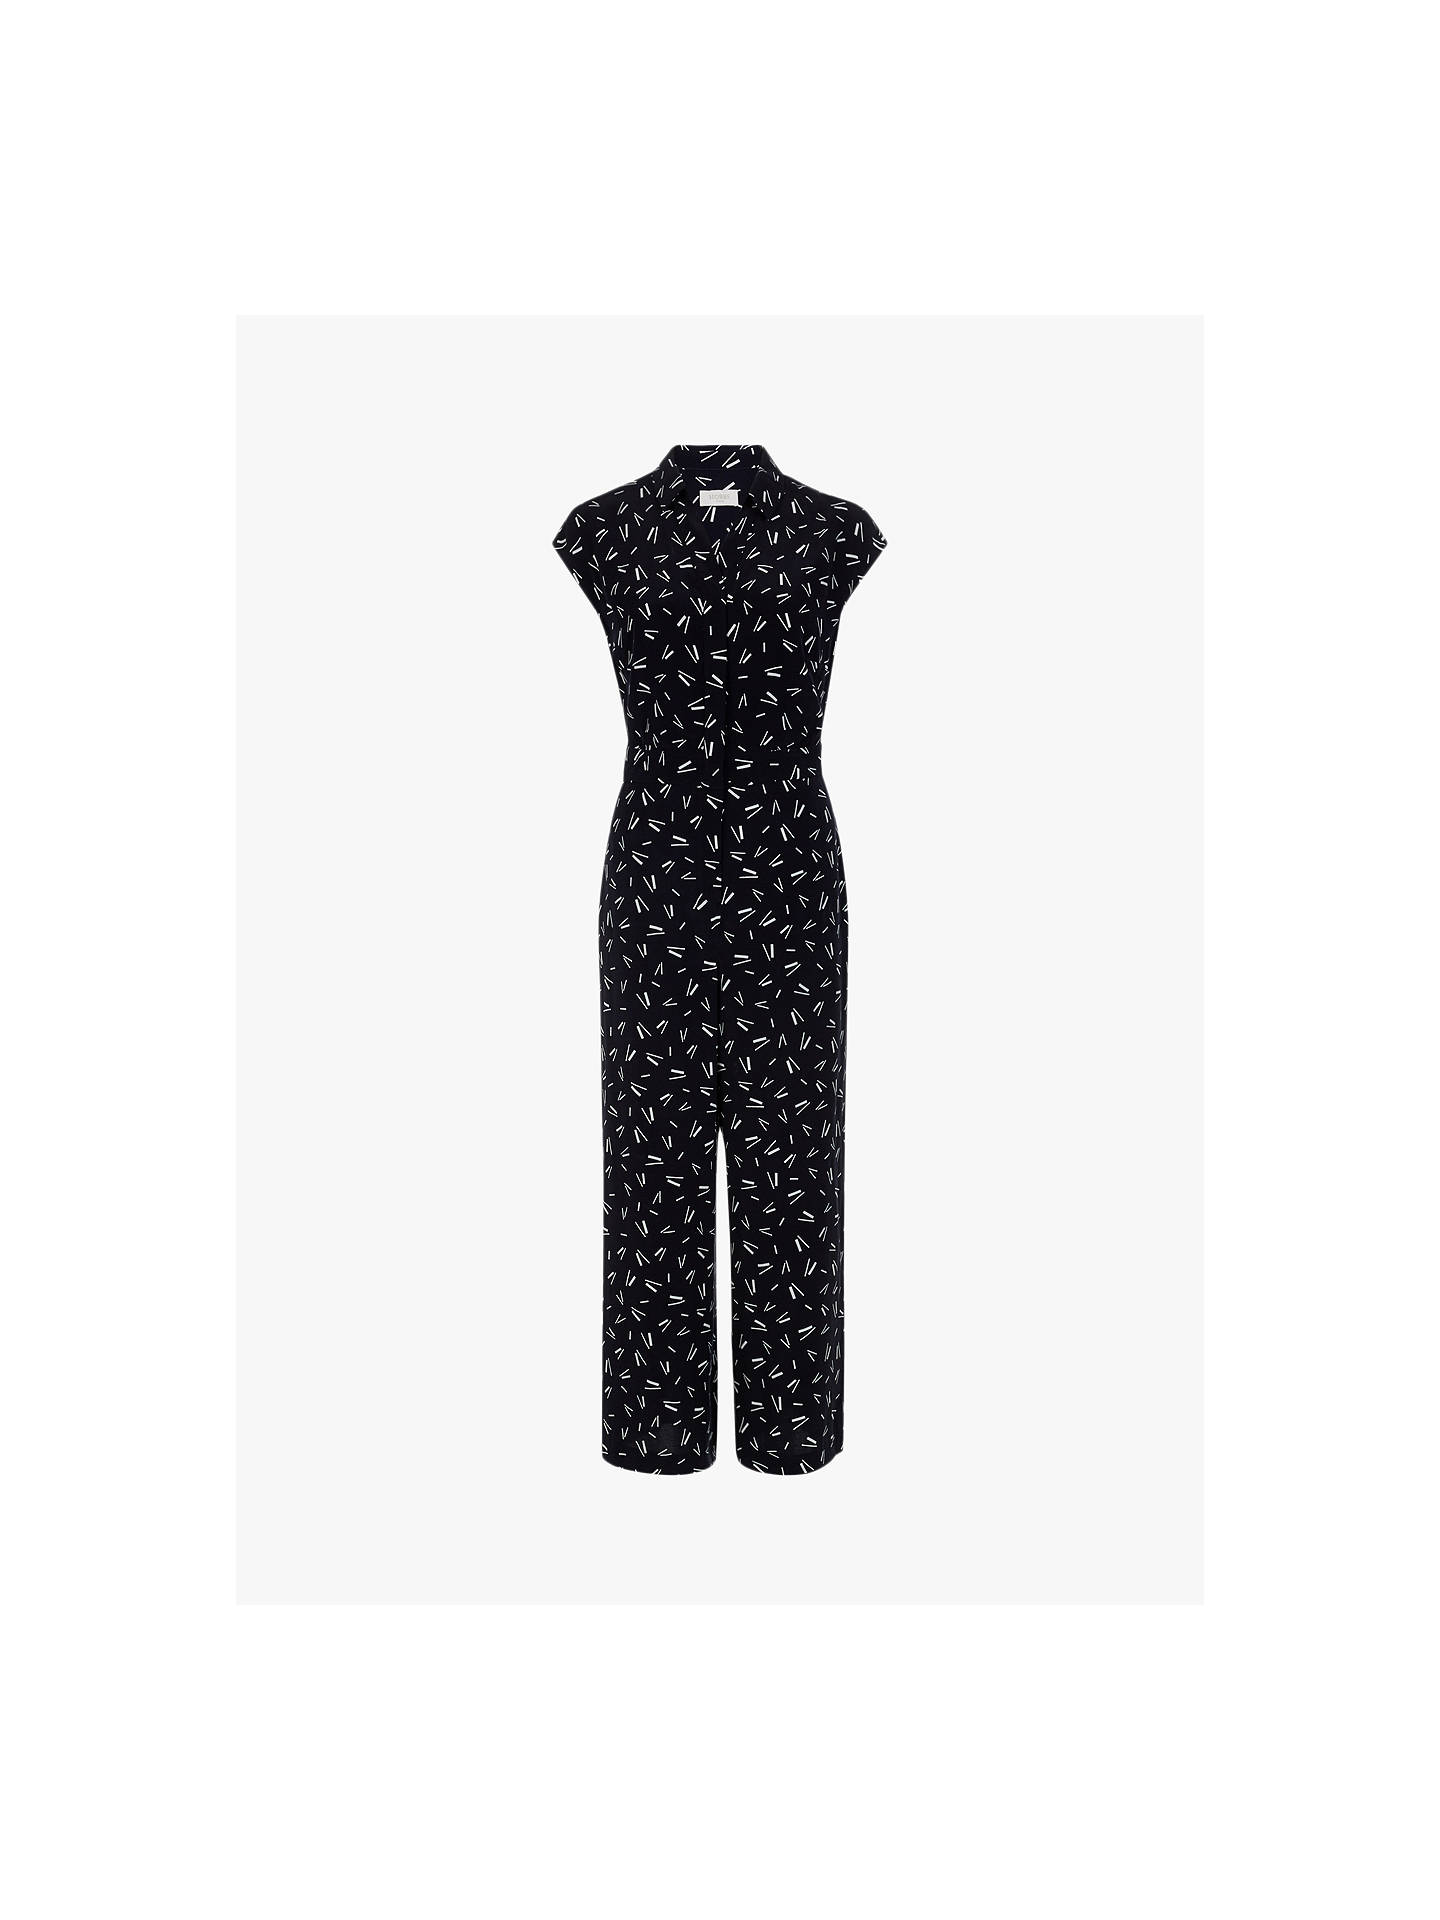 laest technology best collection official shop Hobbs Belinda Jumpsuit, Navy/Ivory